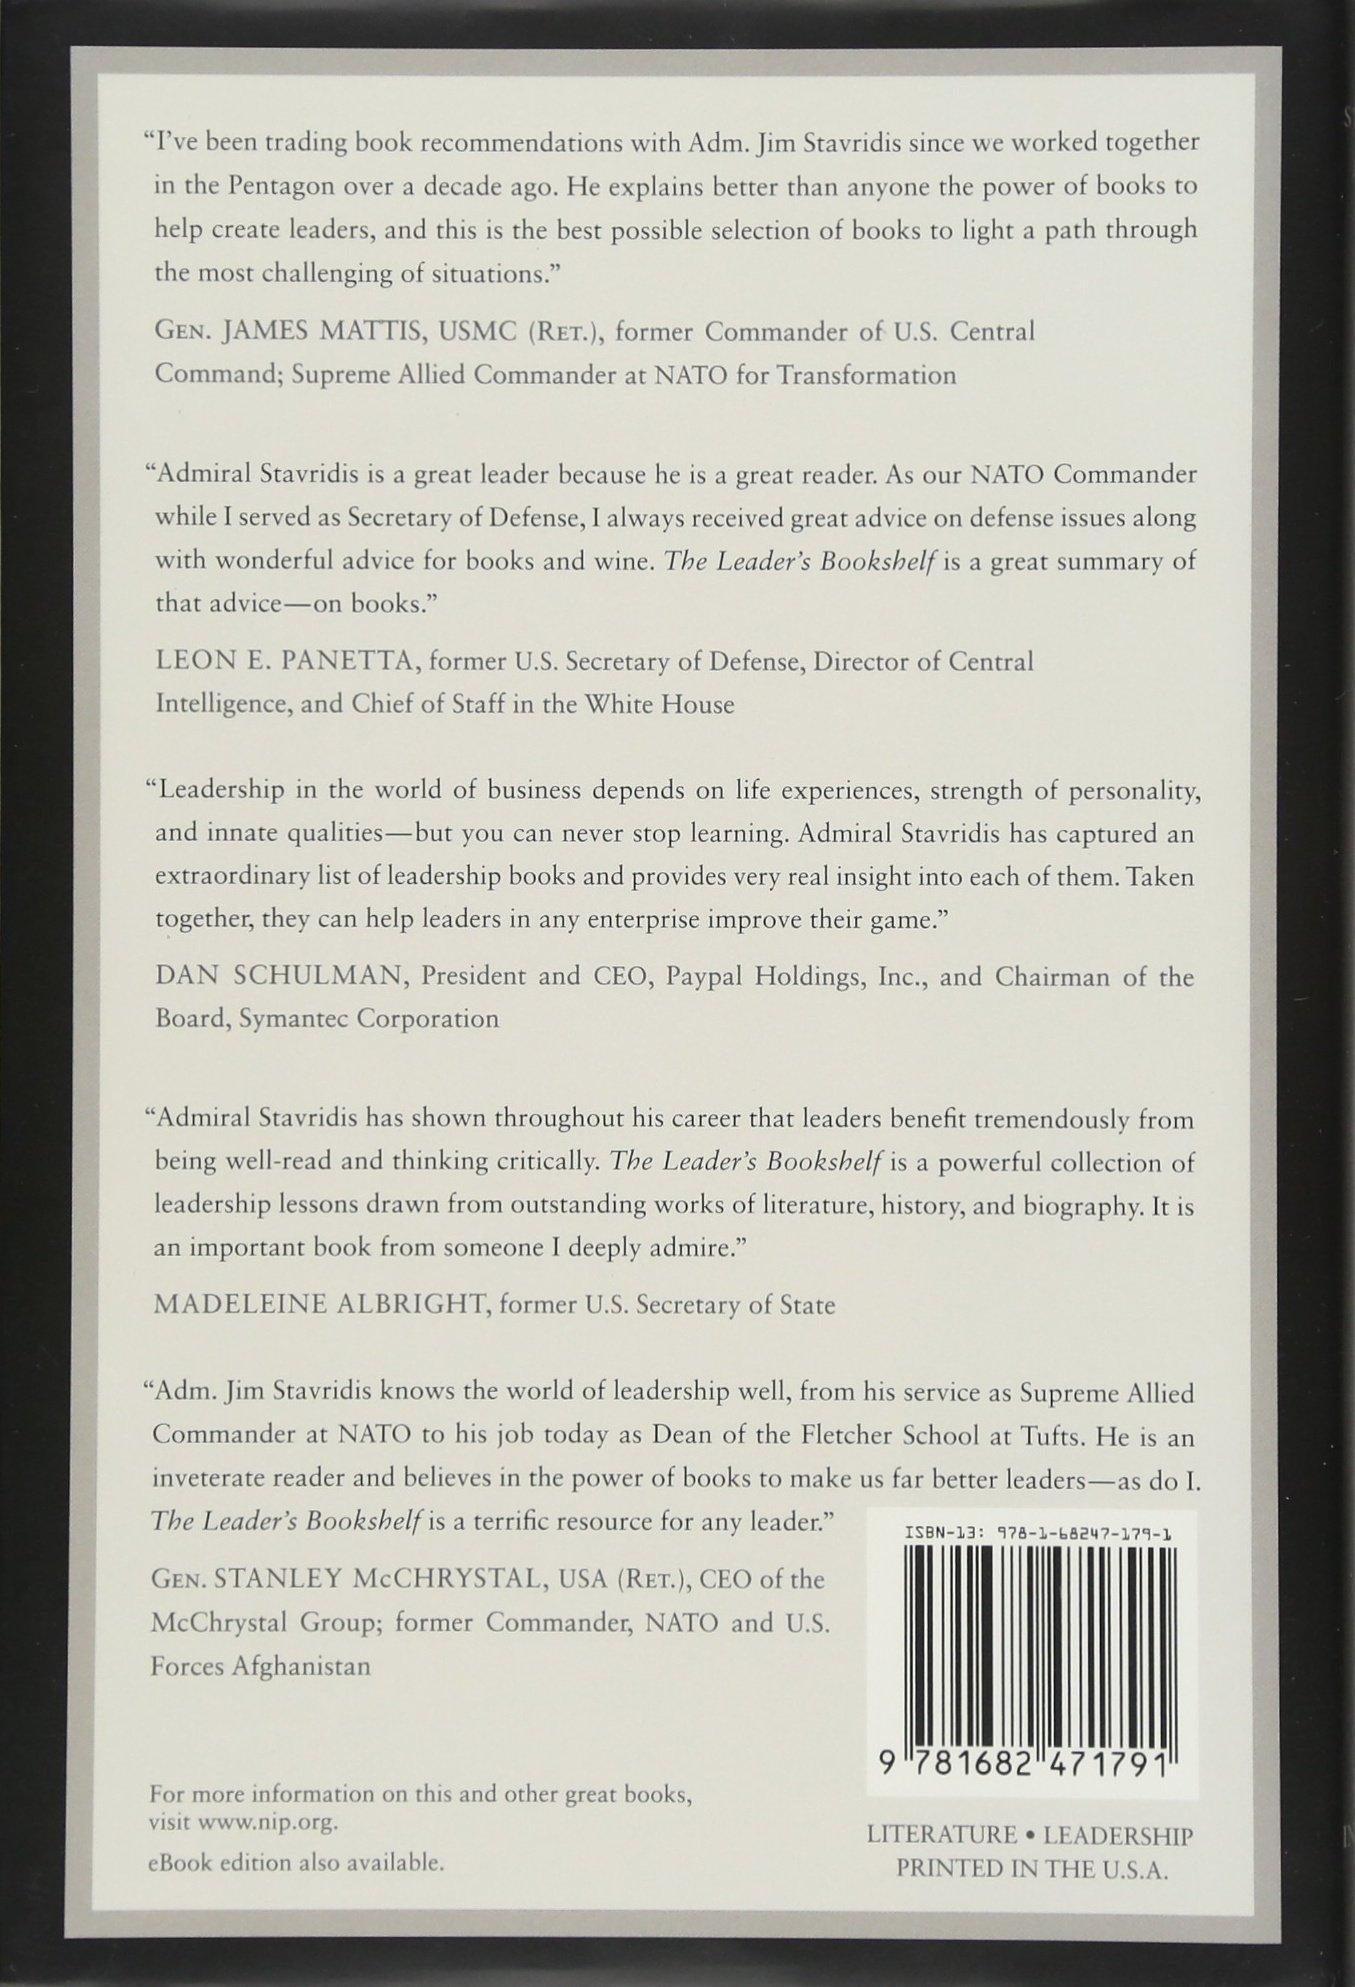 The Leaders Bookshelf Amazoncouk James Stavridis RManning Ancell 4708364246084 Books